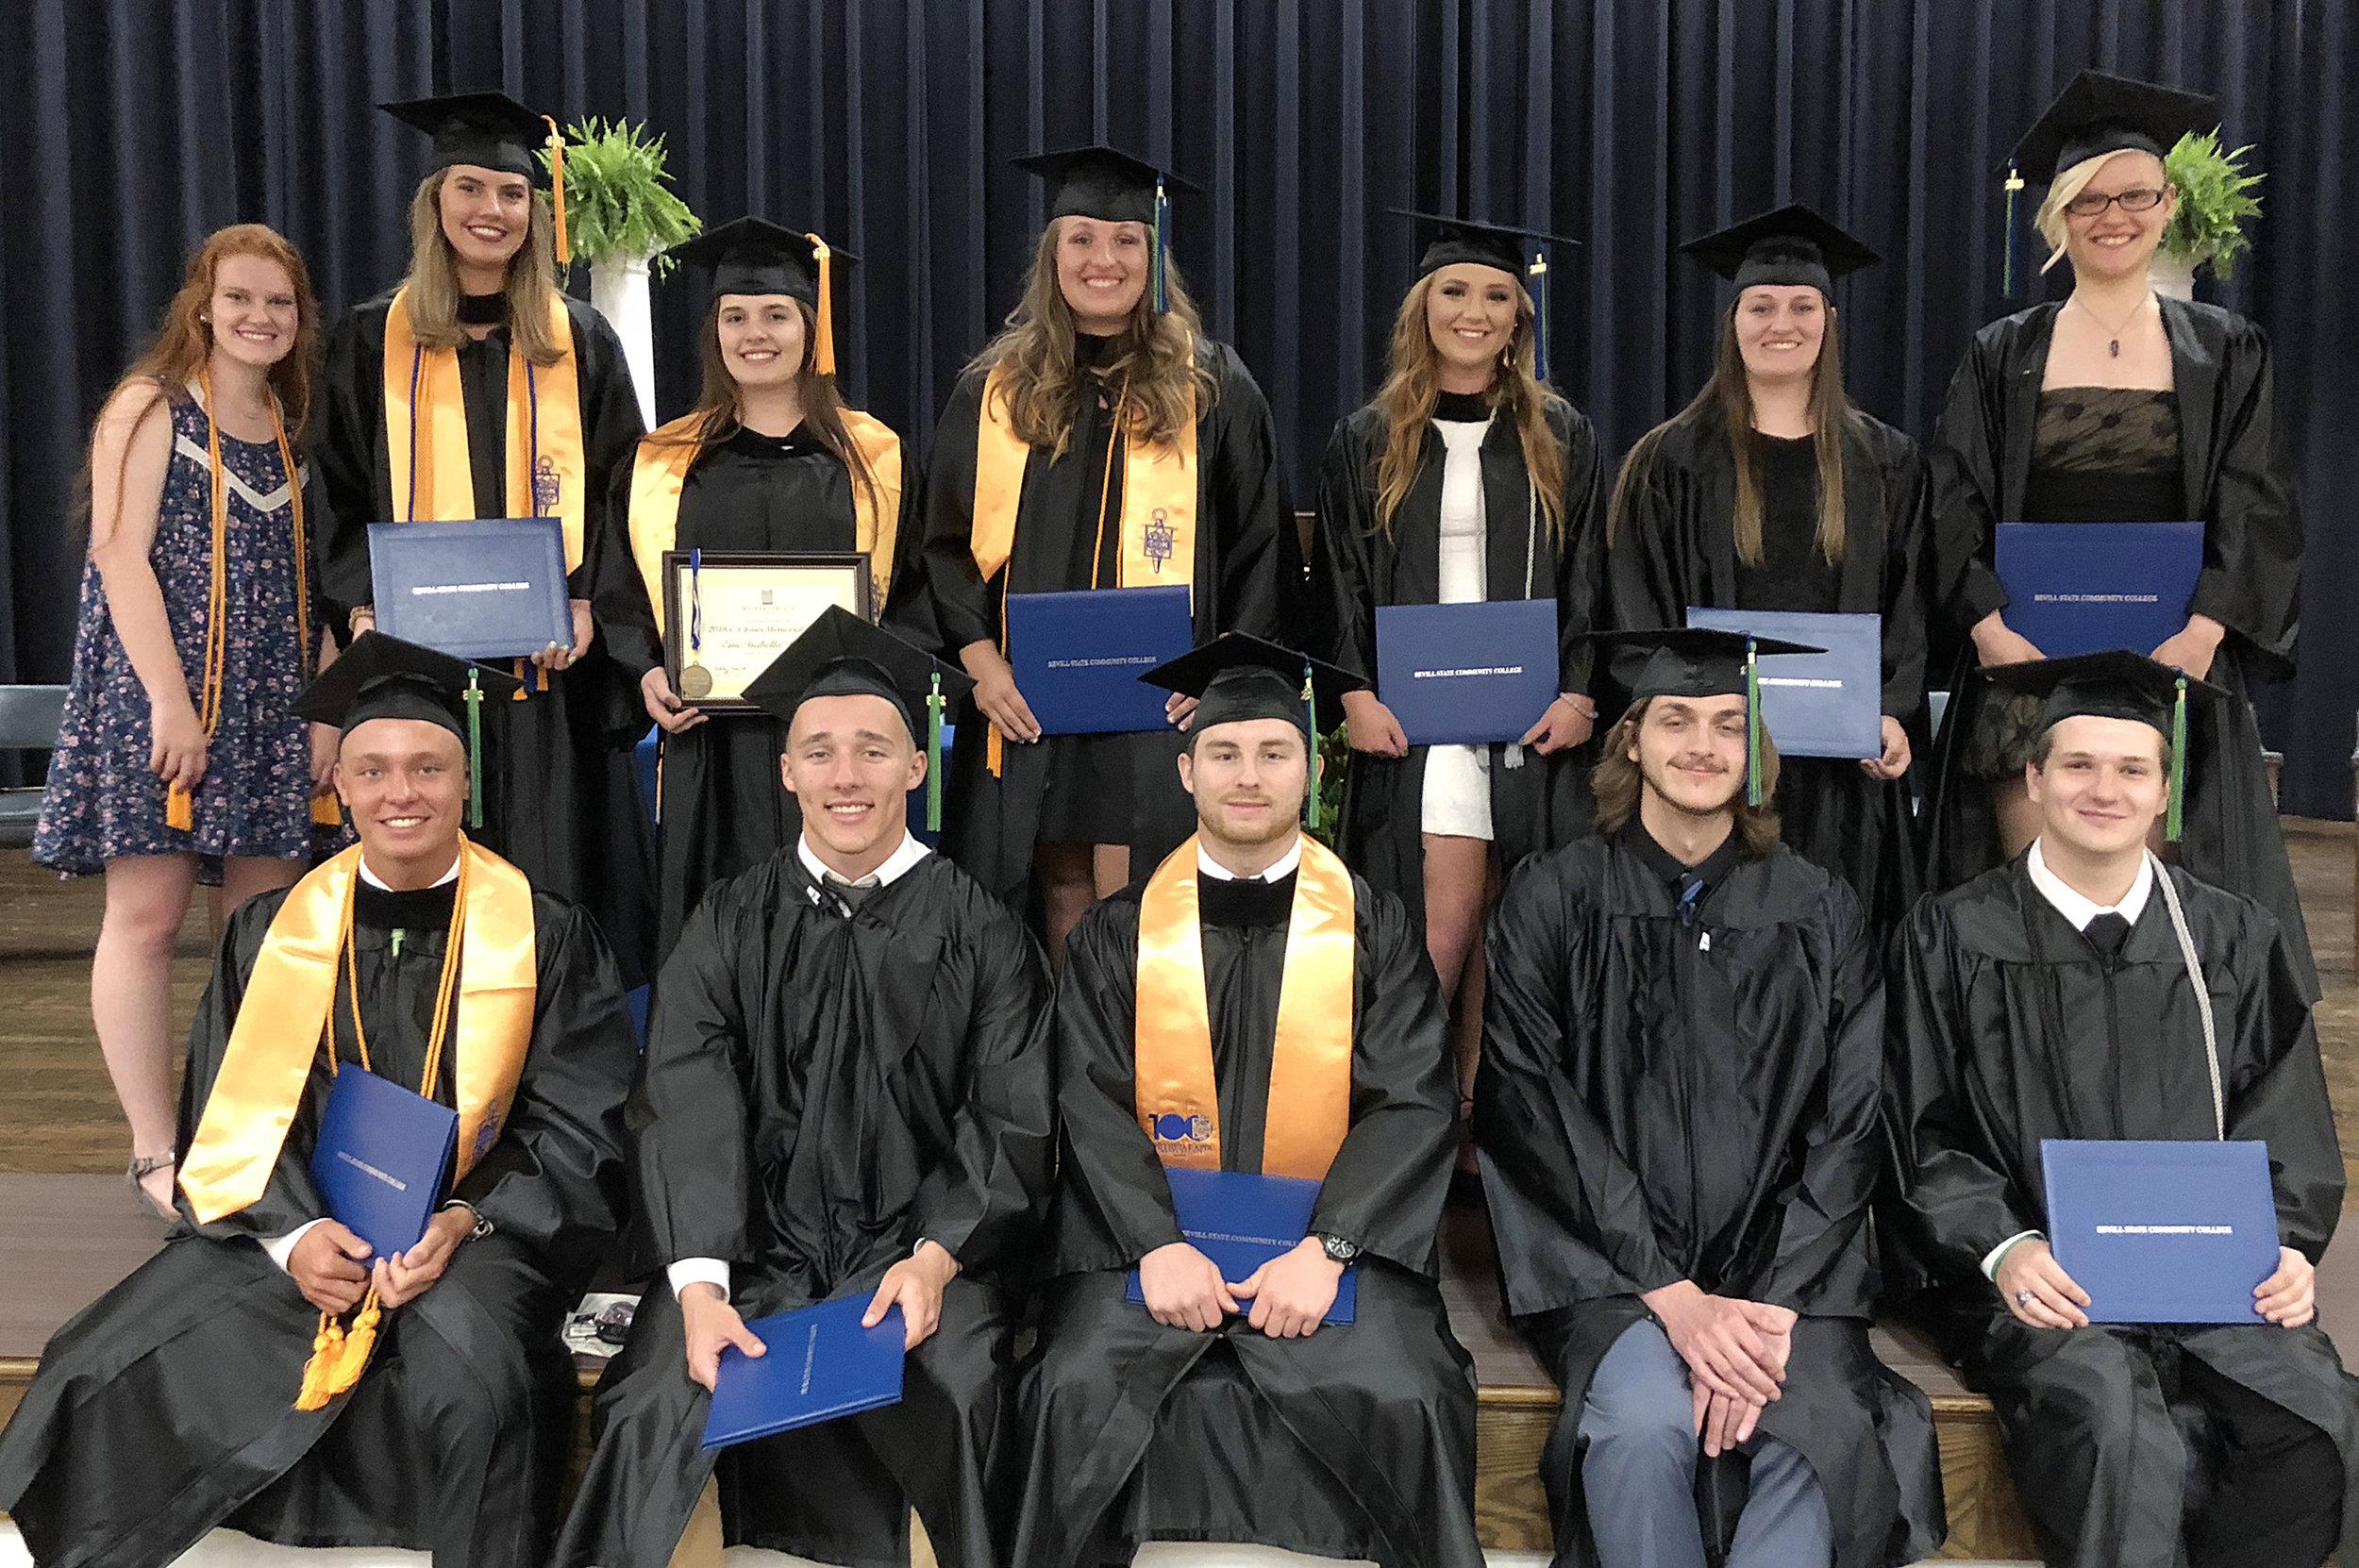 2018 Scholars Society graduates - Back row: Morgan, Ashton, Emi, Taylor, Mica, Emily, Lynzi. Front row: Jonah Trotter, Brady, Colton, Jacob, Justin. Not pictured: Walker, Madisyn, Kennedy, Anna, Joshua, Landi, Jonah Guthrie, Trenton, Rebecca, and Gracie.